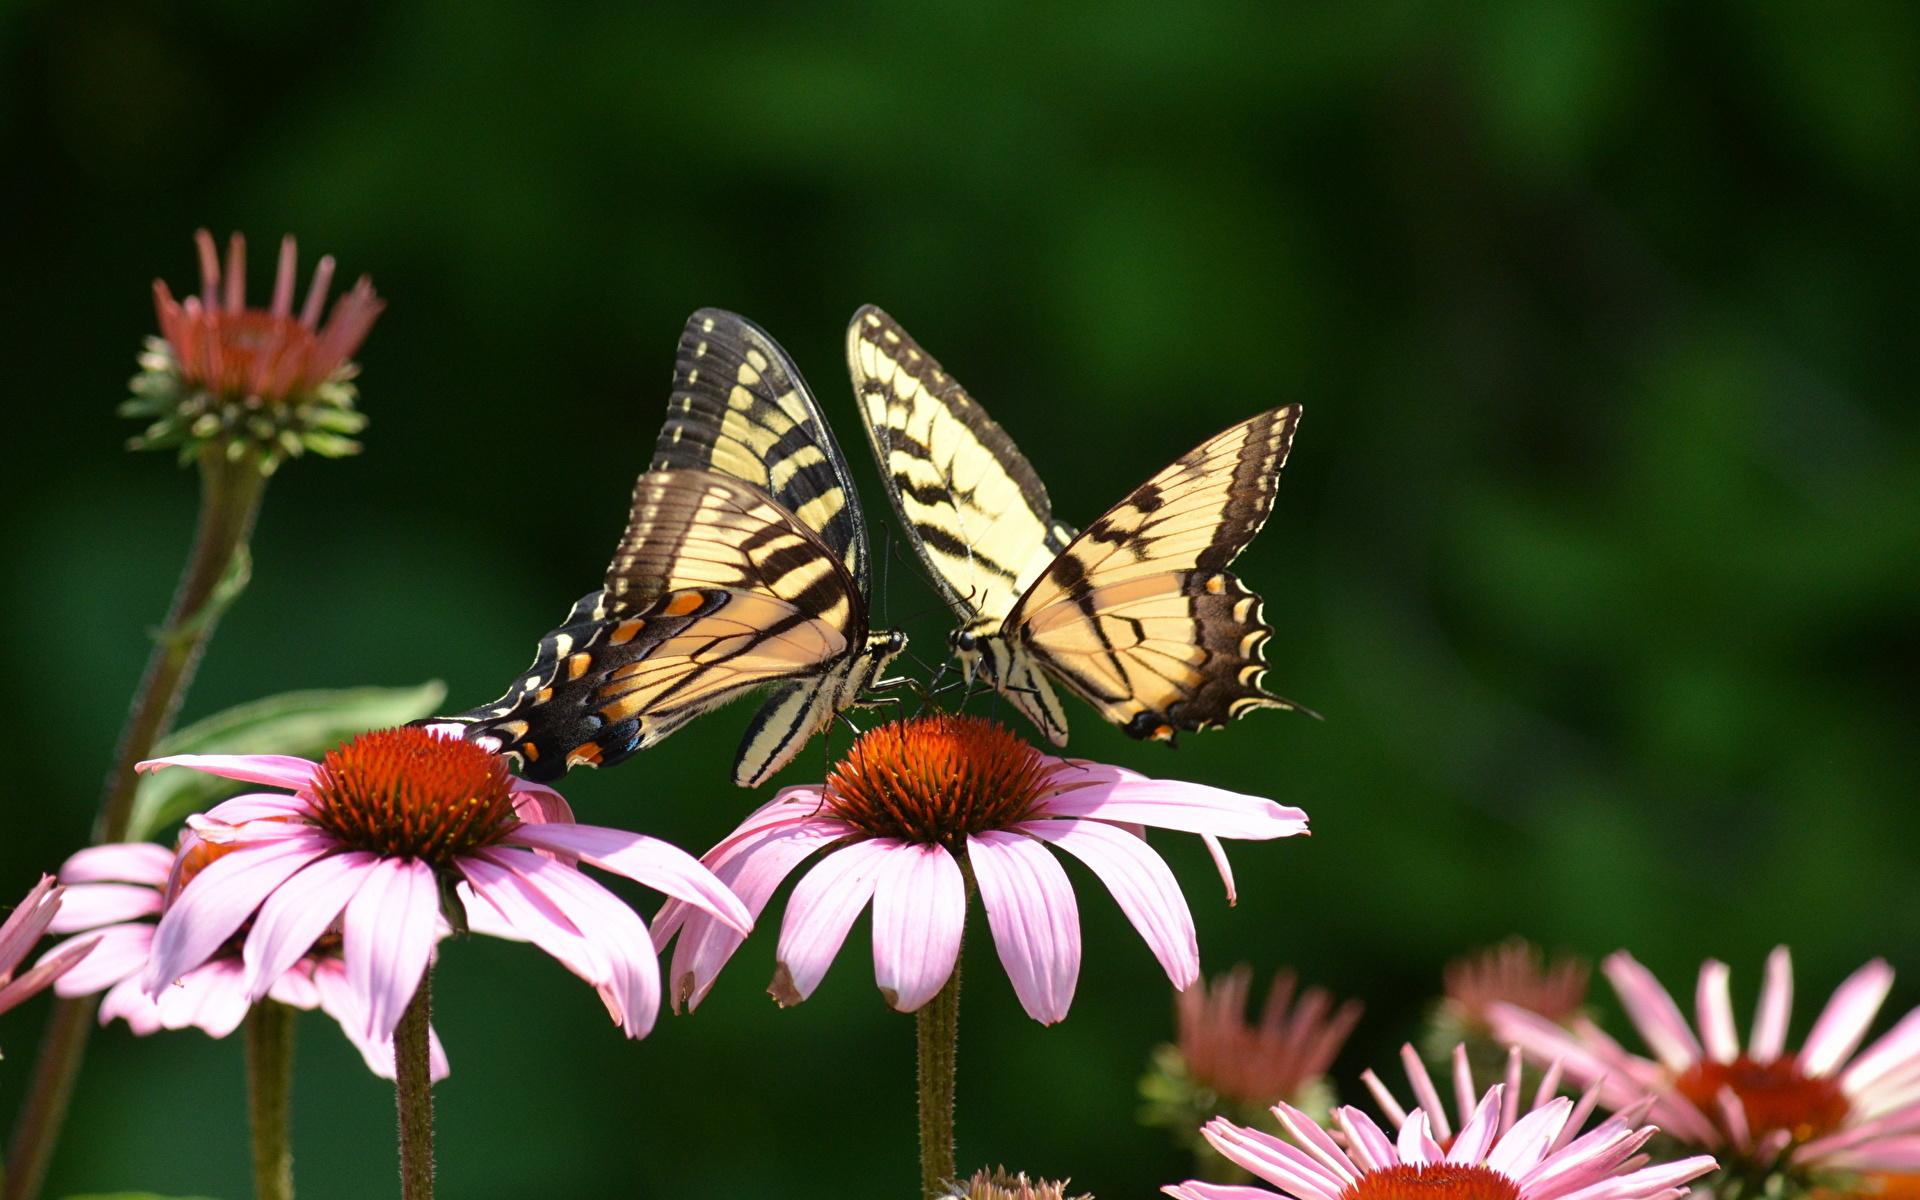 https://s1.1zoom.ru/b5050/918/Butterflies_Insects_438111_1920x1200.jpg